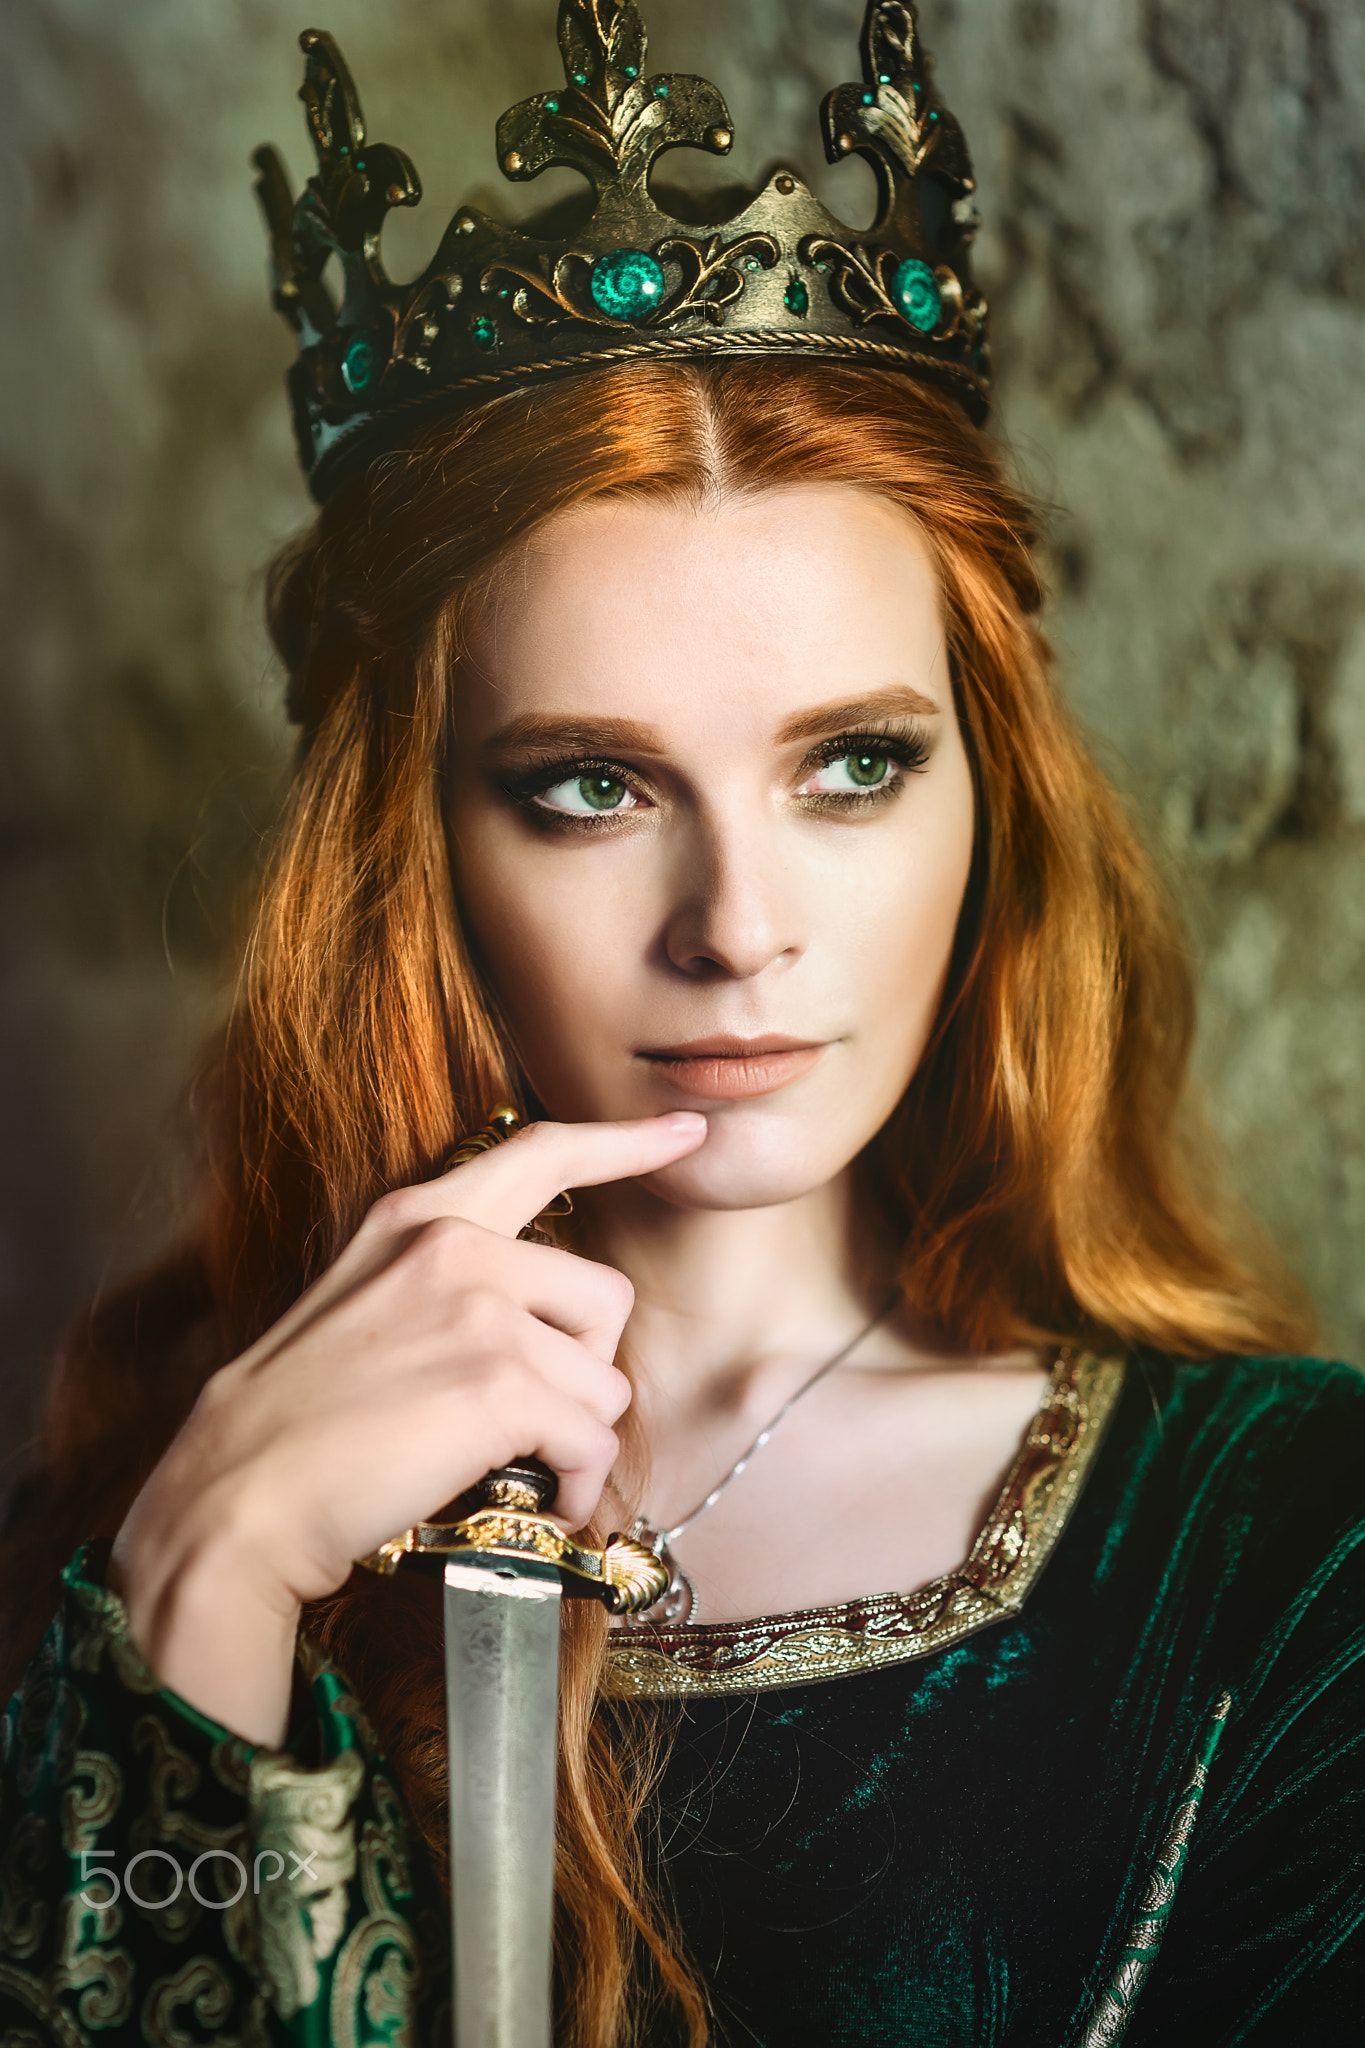 Woman In Green Medieval Dress Portrait Of A Beautiful Red Haired Woman In Green Medieval Dress Green Medieval Dress Fantasy Queen Medieval Princess [ 2048 x 1365 Pixel ]